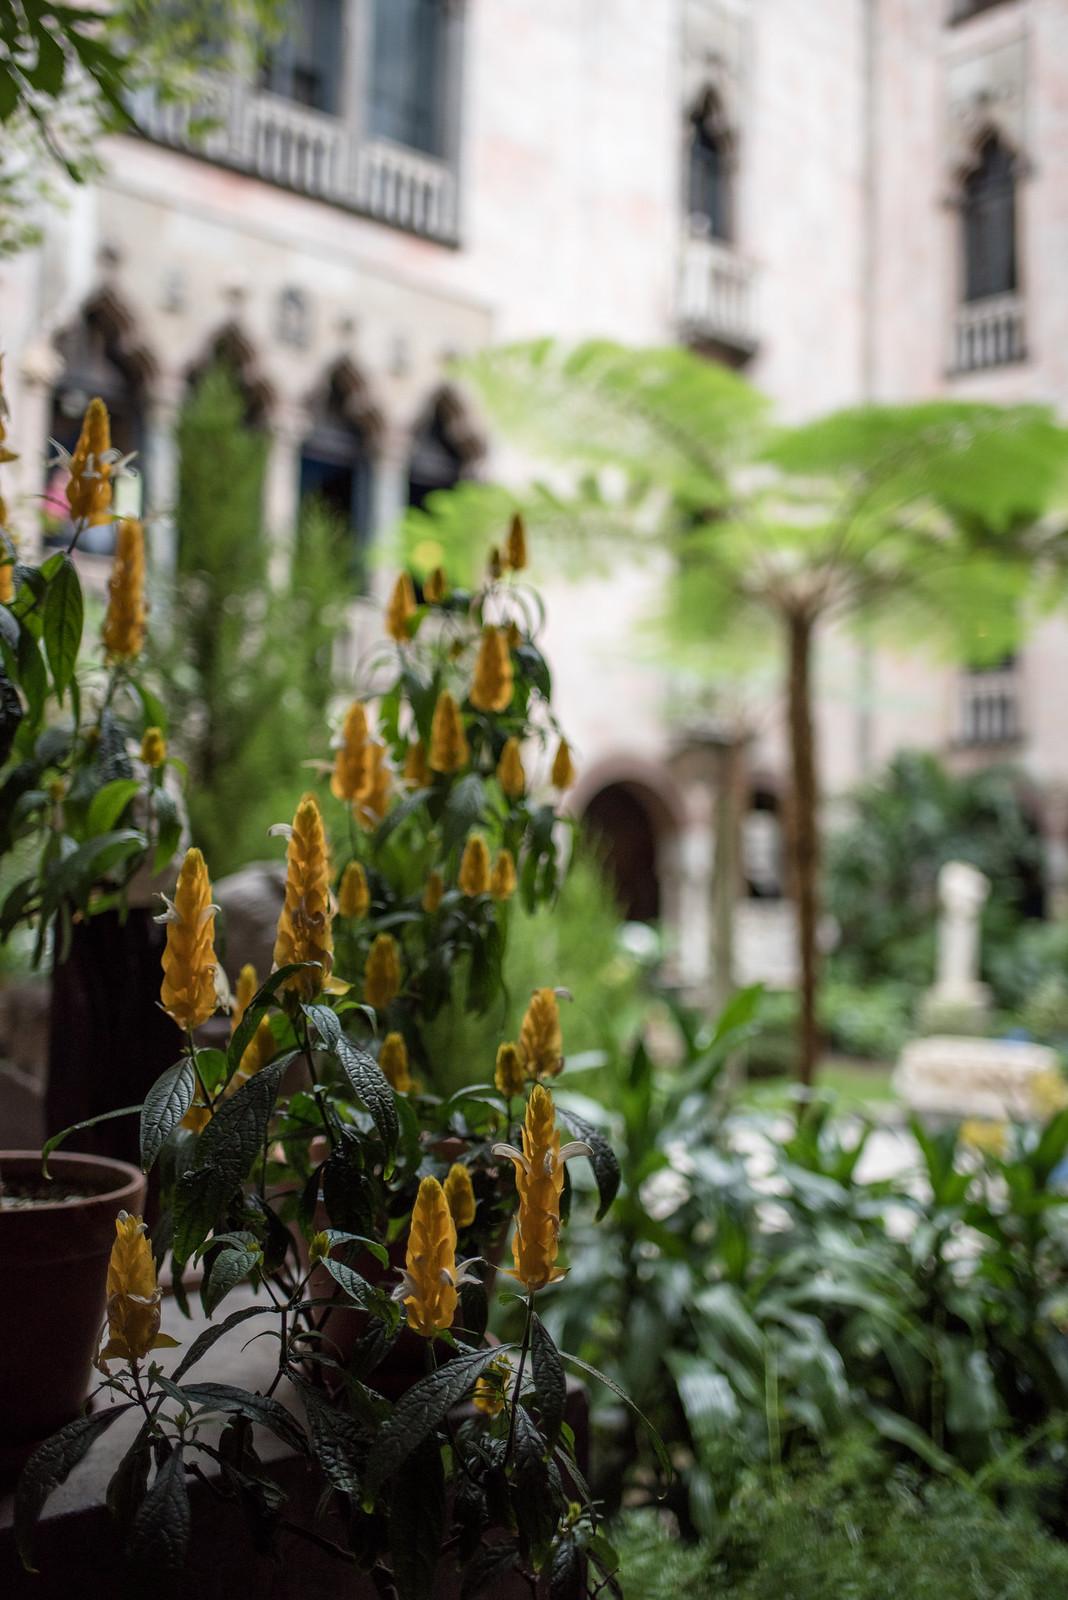 Isabella Stewart Gardner Museum on juliettelaura.blogspot.com